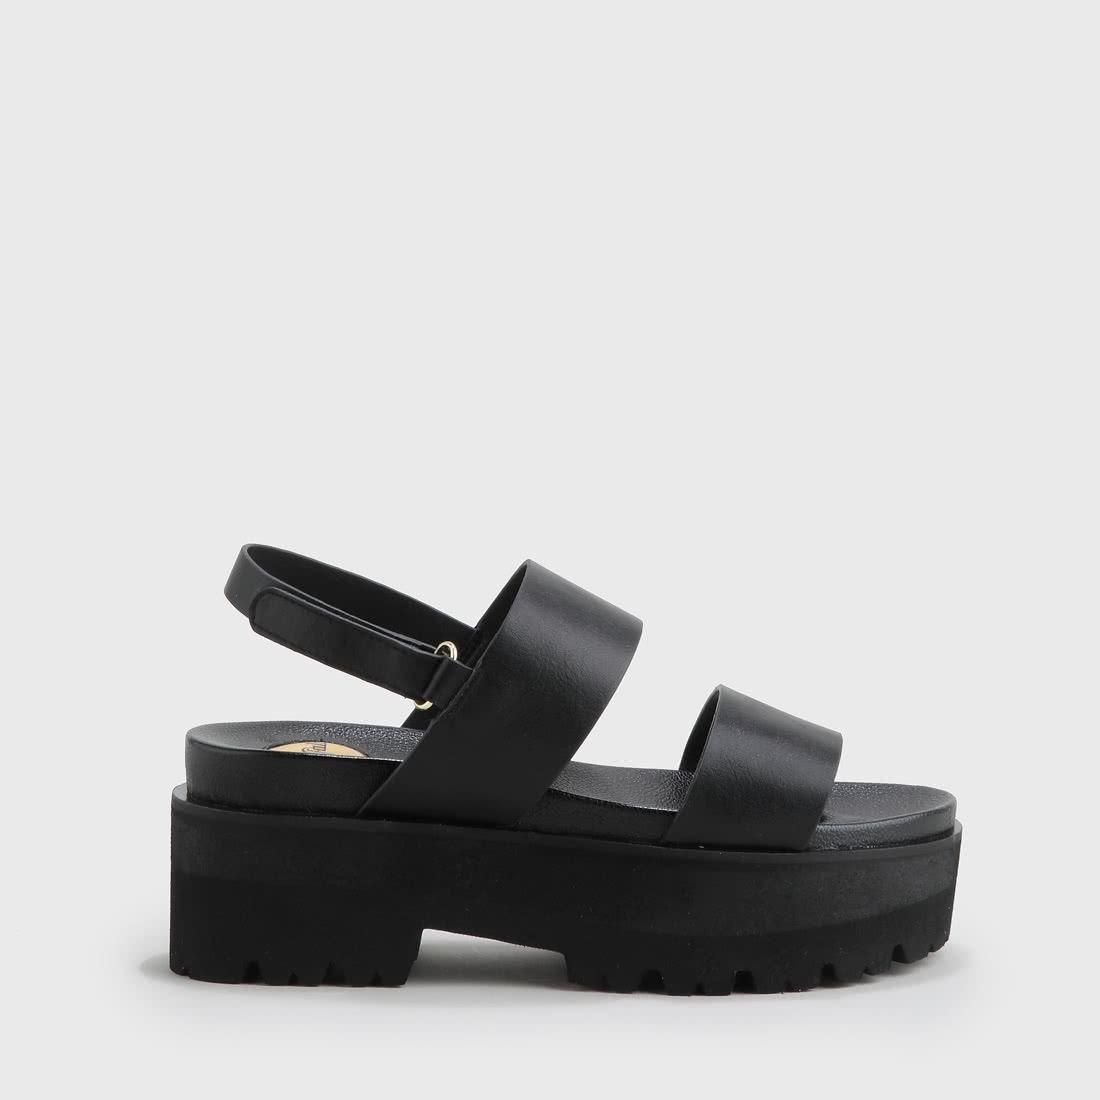 776bc0dd1 Elita Sandal Platform Black buy online in BUFFALO Online-Shop | BUFFALO®